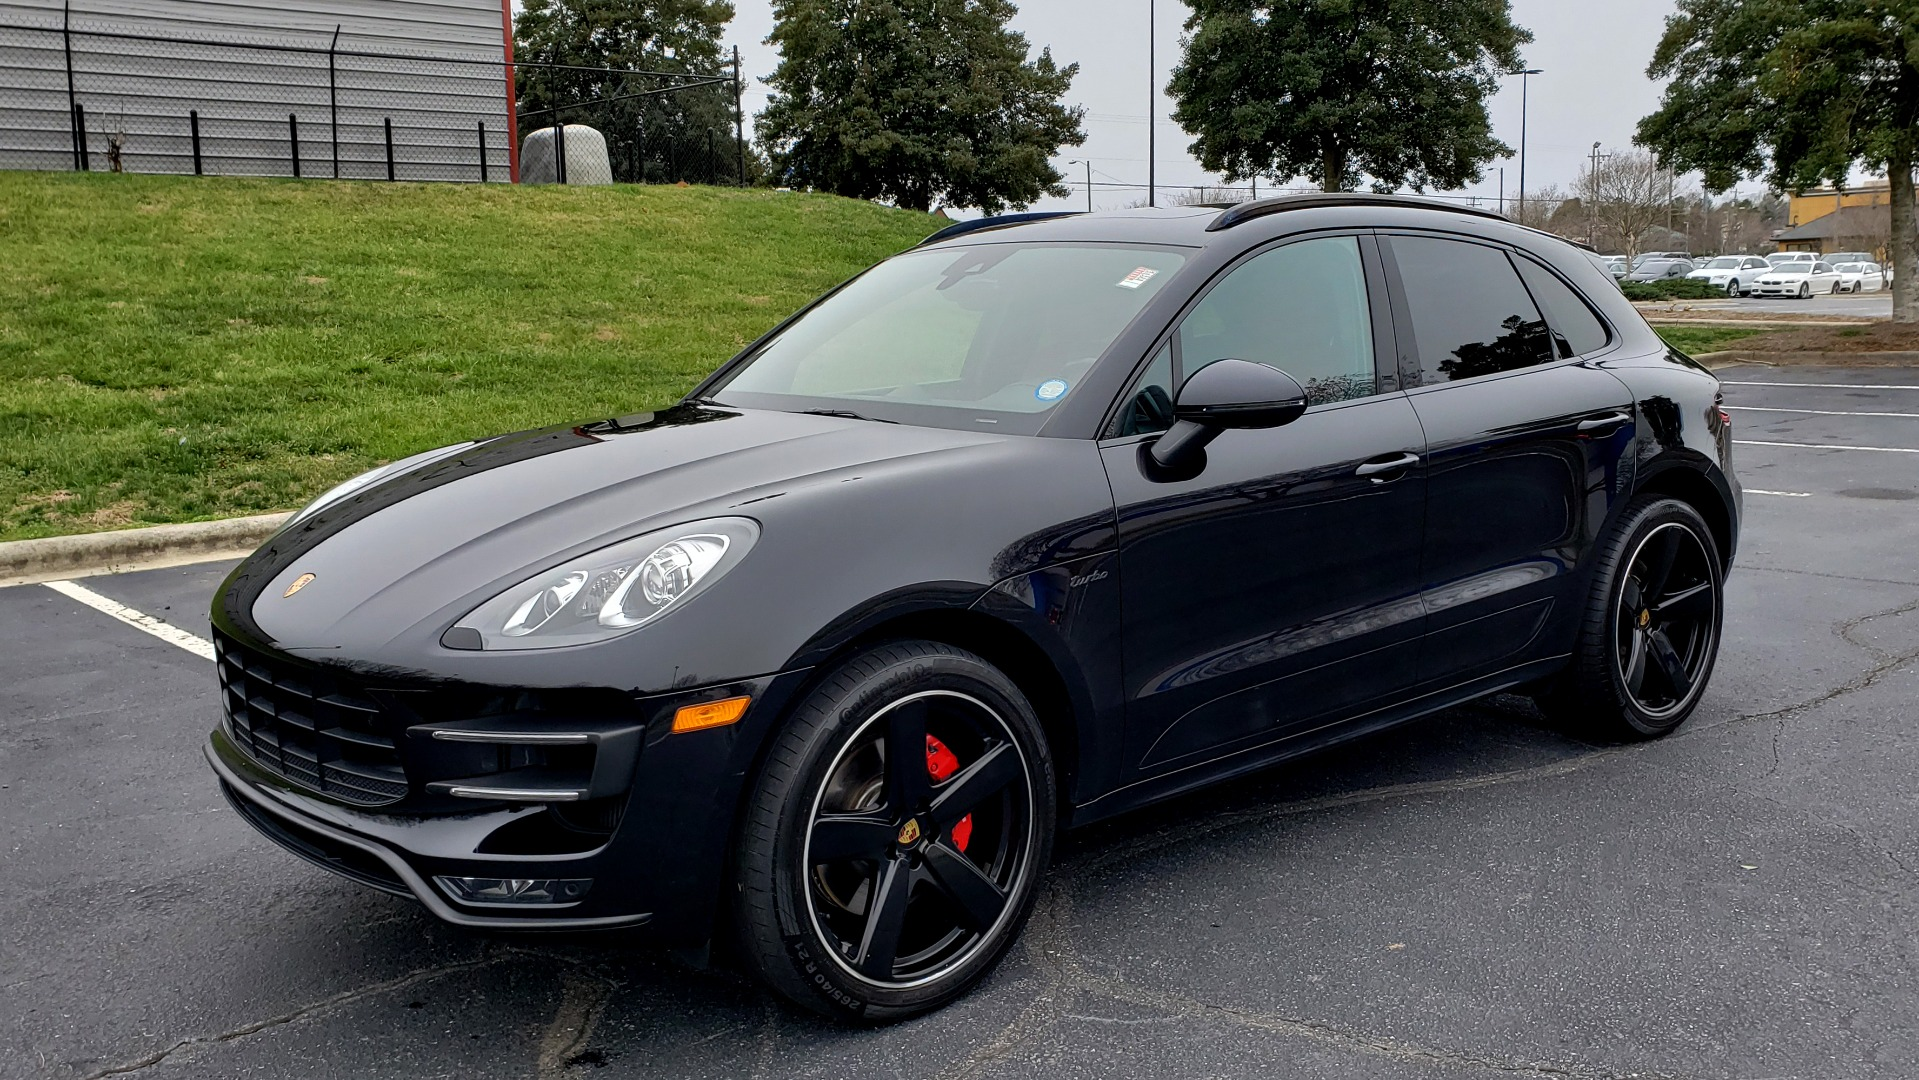 Used 2016 Porsche MACAN TURBO / PREM / NAV / PARK ASST / BOSE / PDK / CHRONO PKG for sale Sold at Formula Imports in Charlotte NC 28227 1